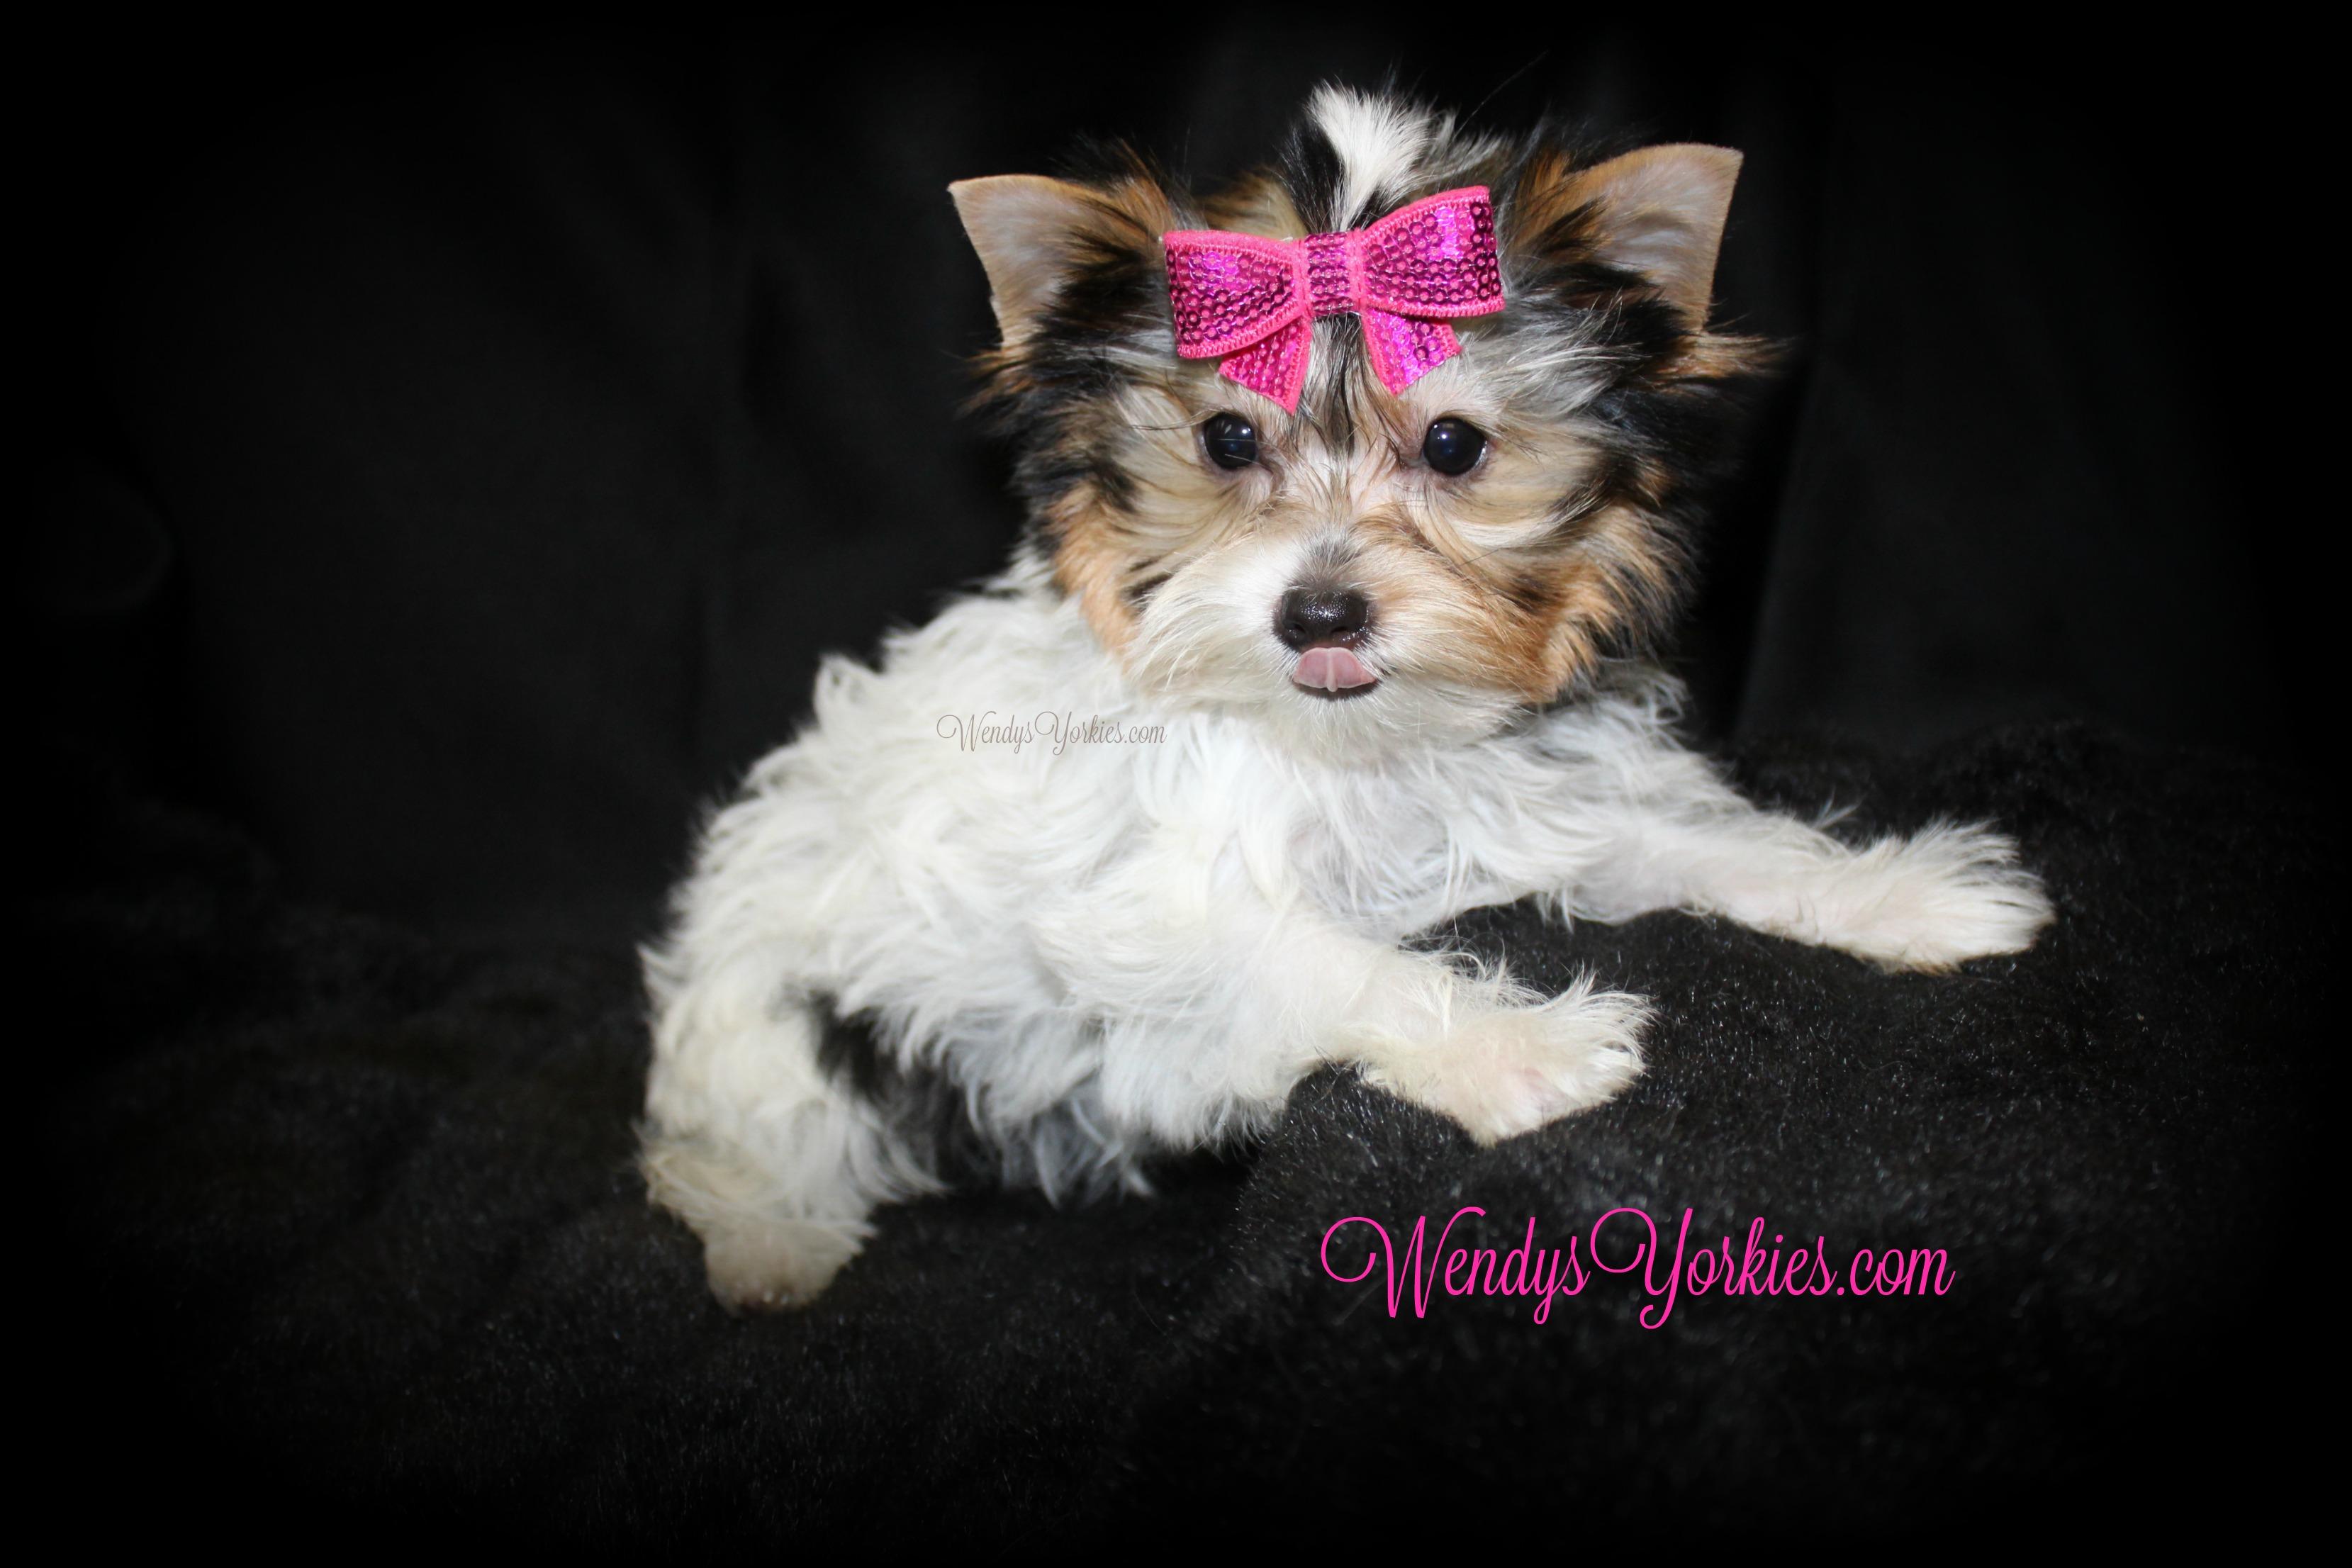 Parti Yorkie puppy for sale, WendysYorkies.com, Daisy pf1